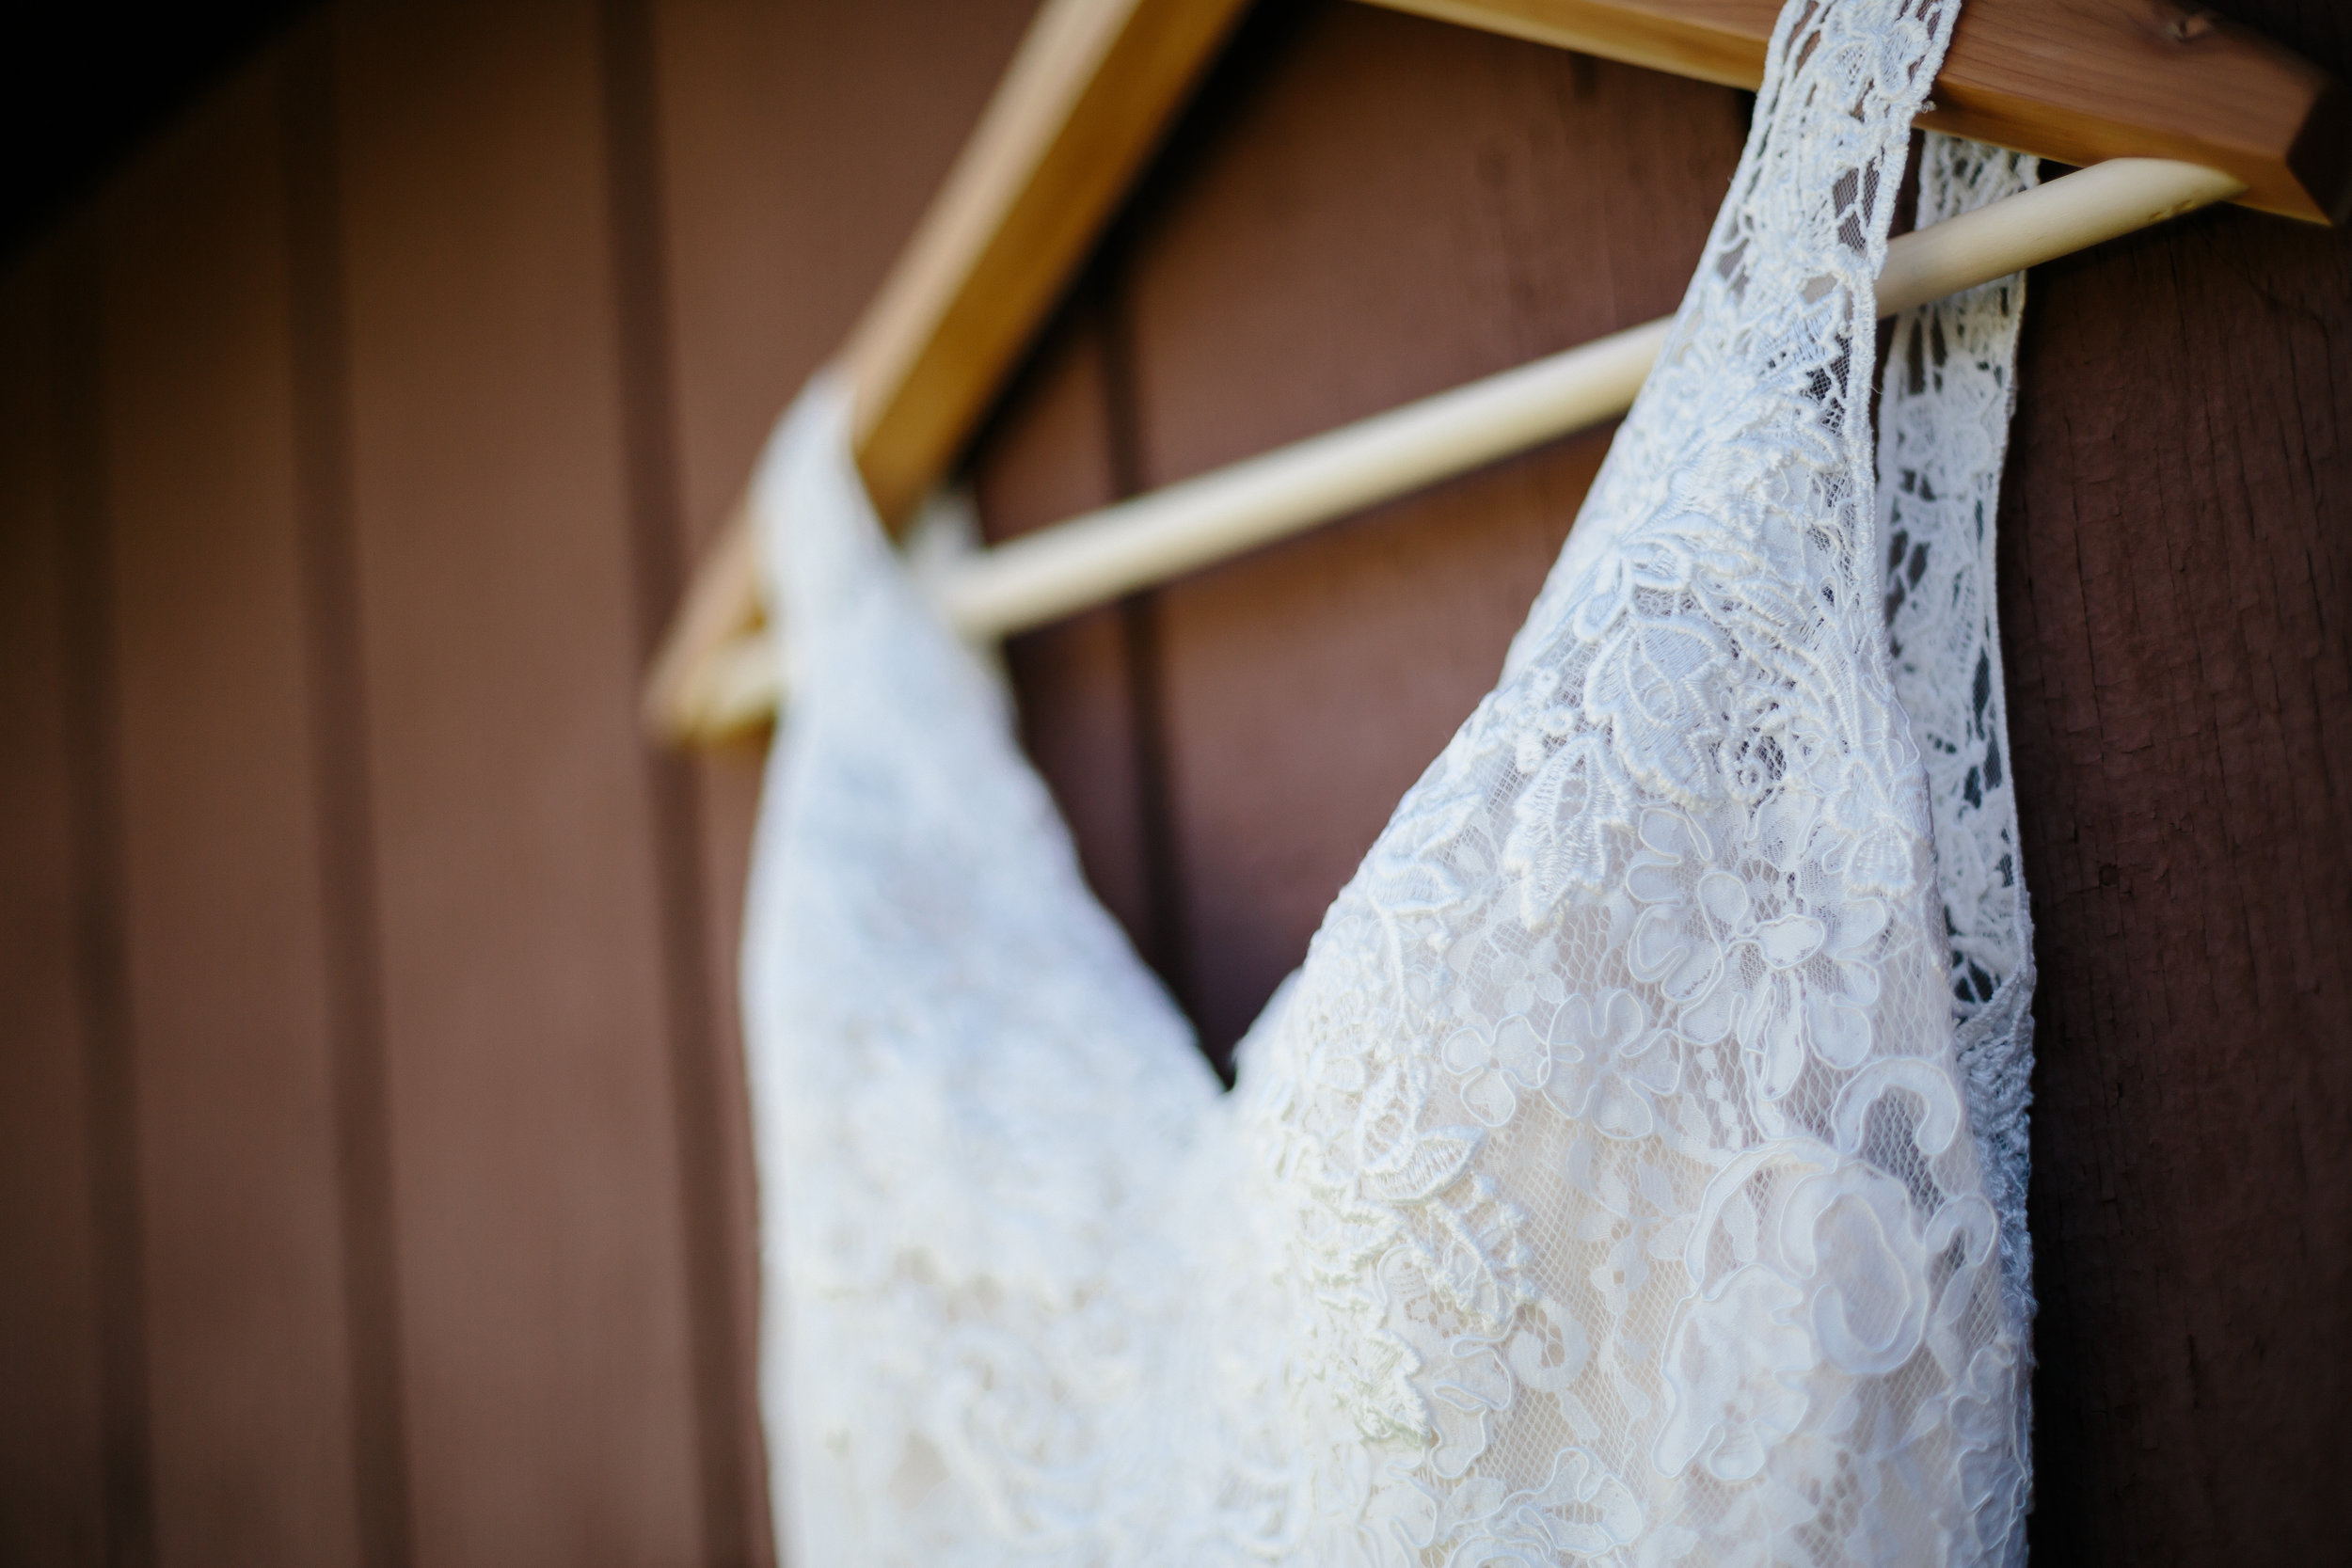 Jordan & Shantel Married - Idaho - Corrie Mick Photography-5.jpg